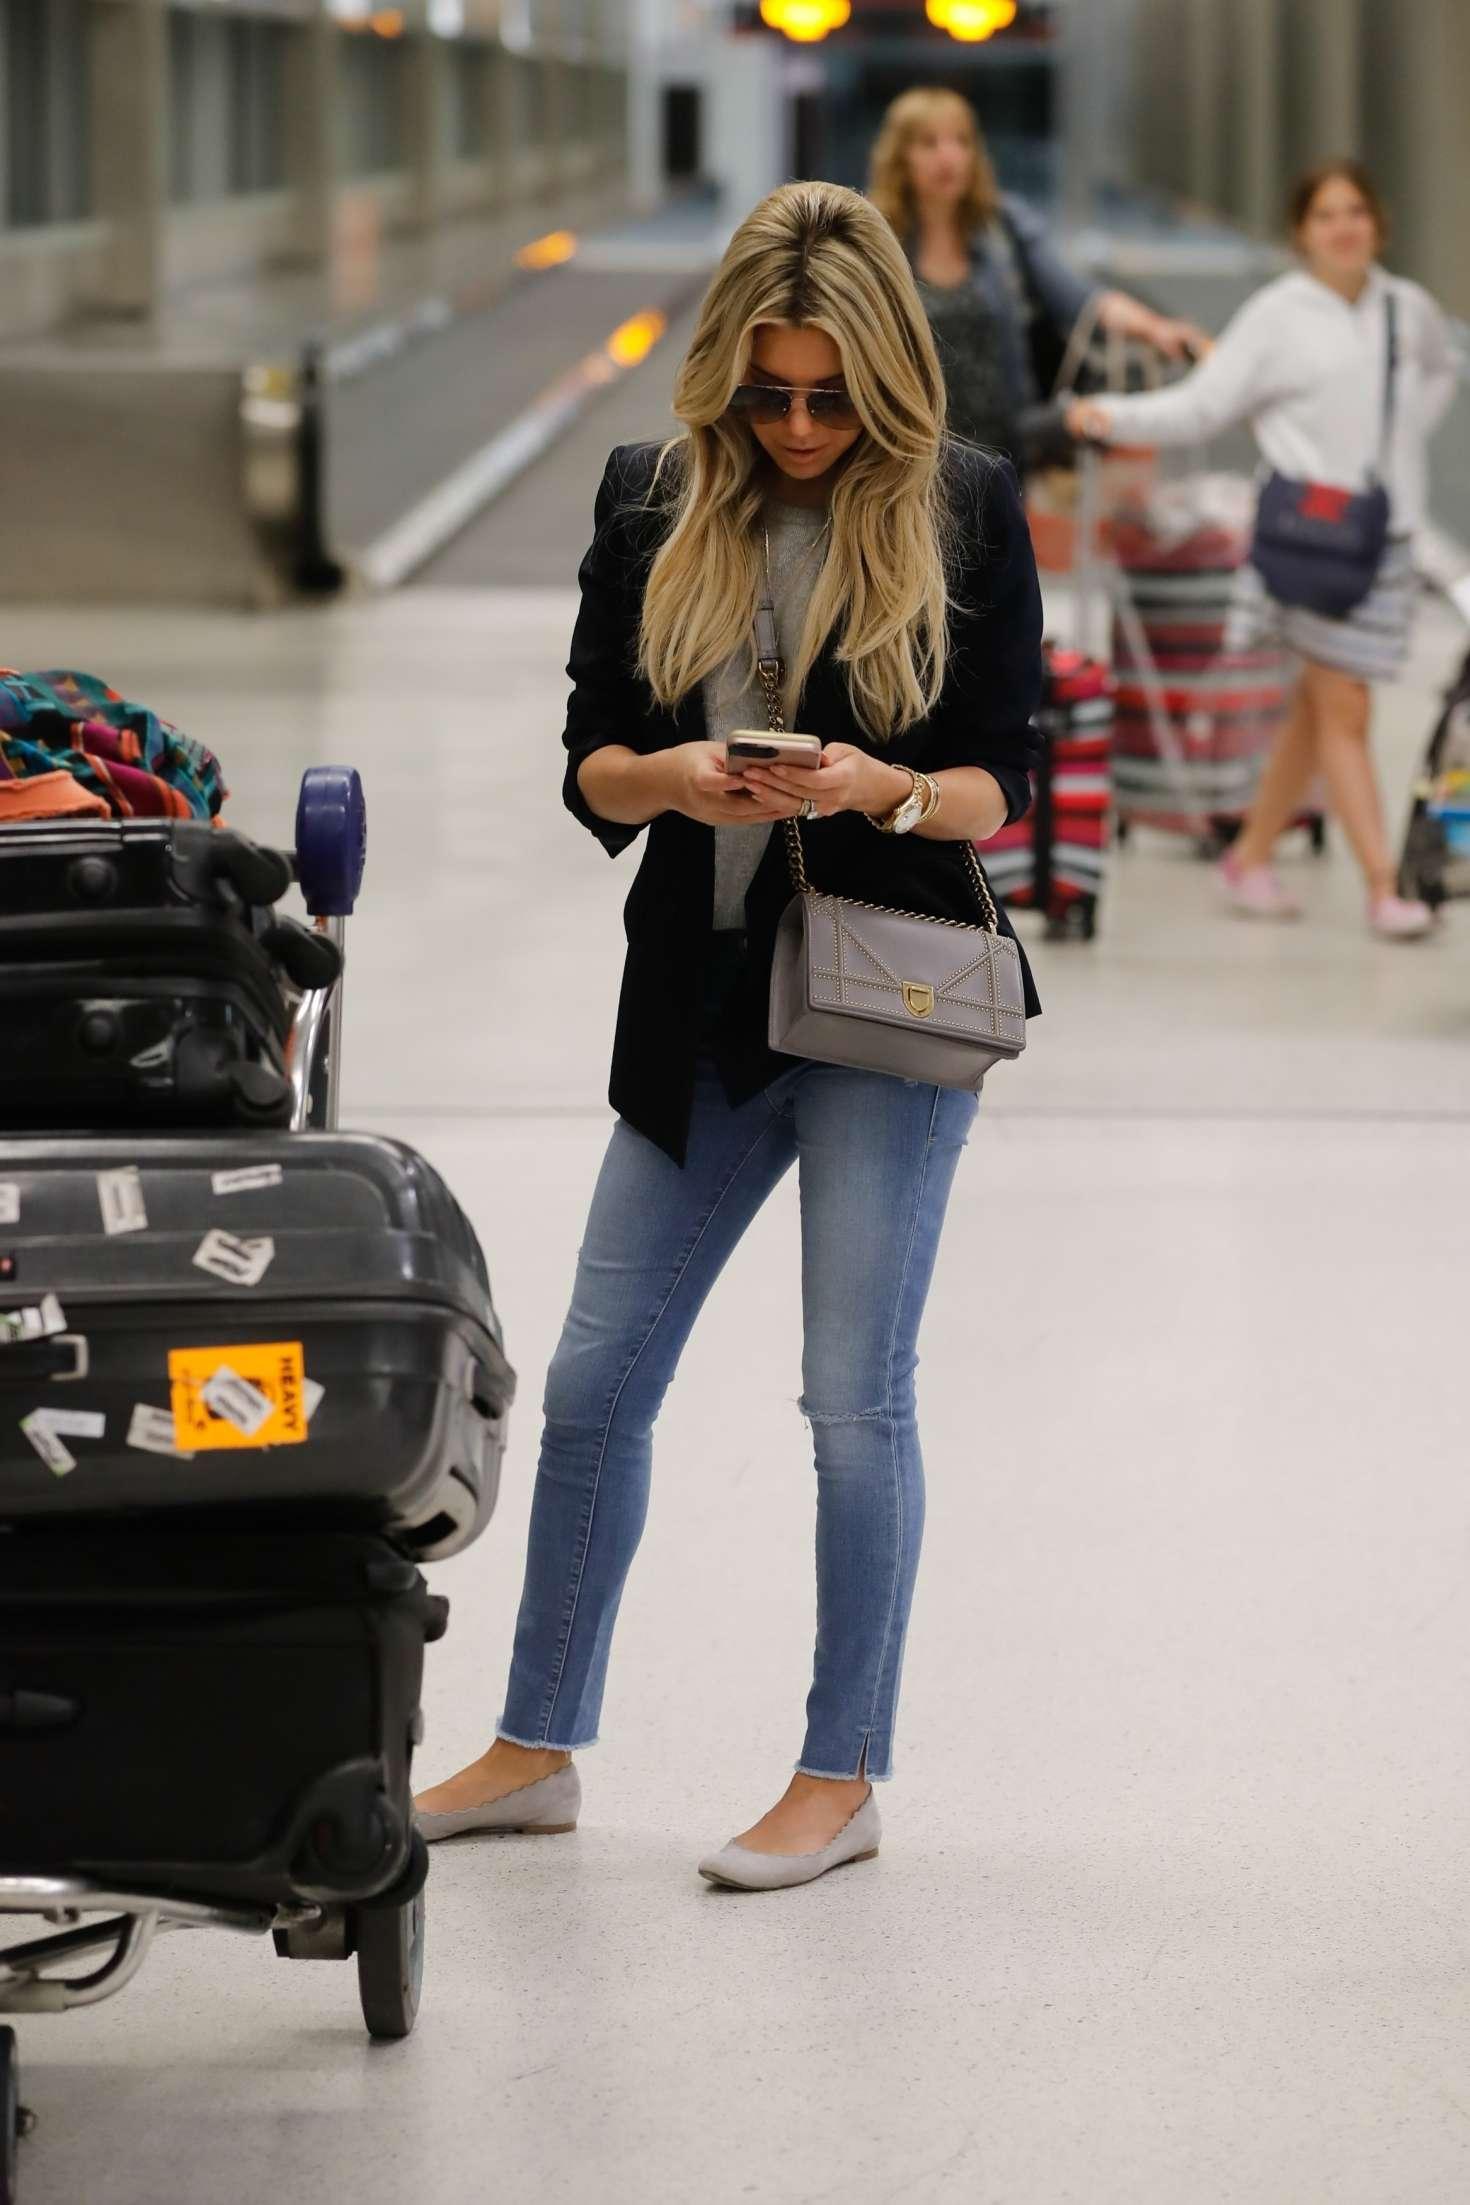 Sylvie Meis 2017 : Sylvie Meis Arrives at Airport in Miami -01